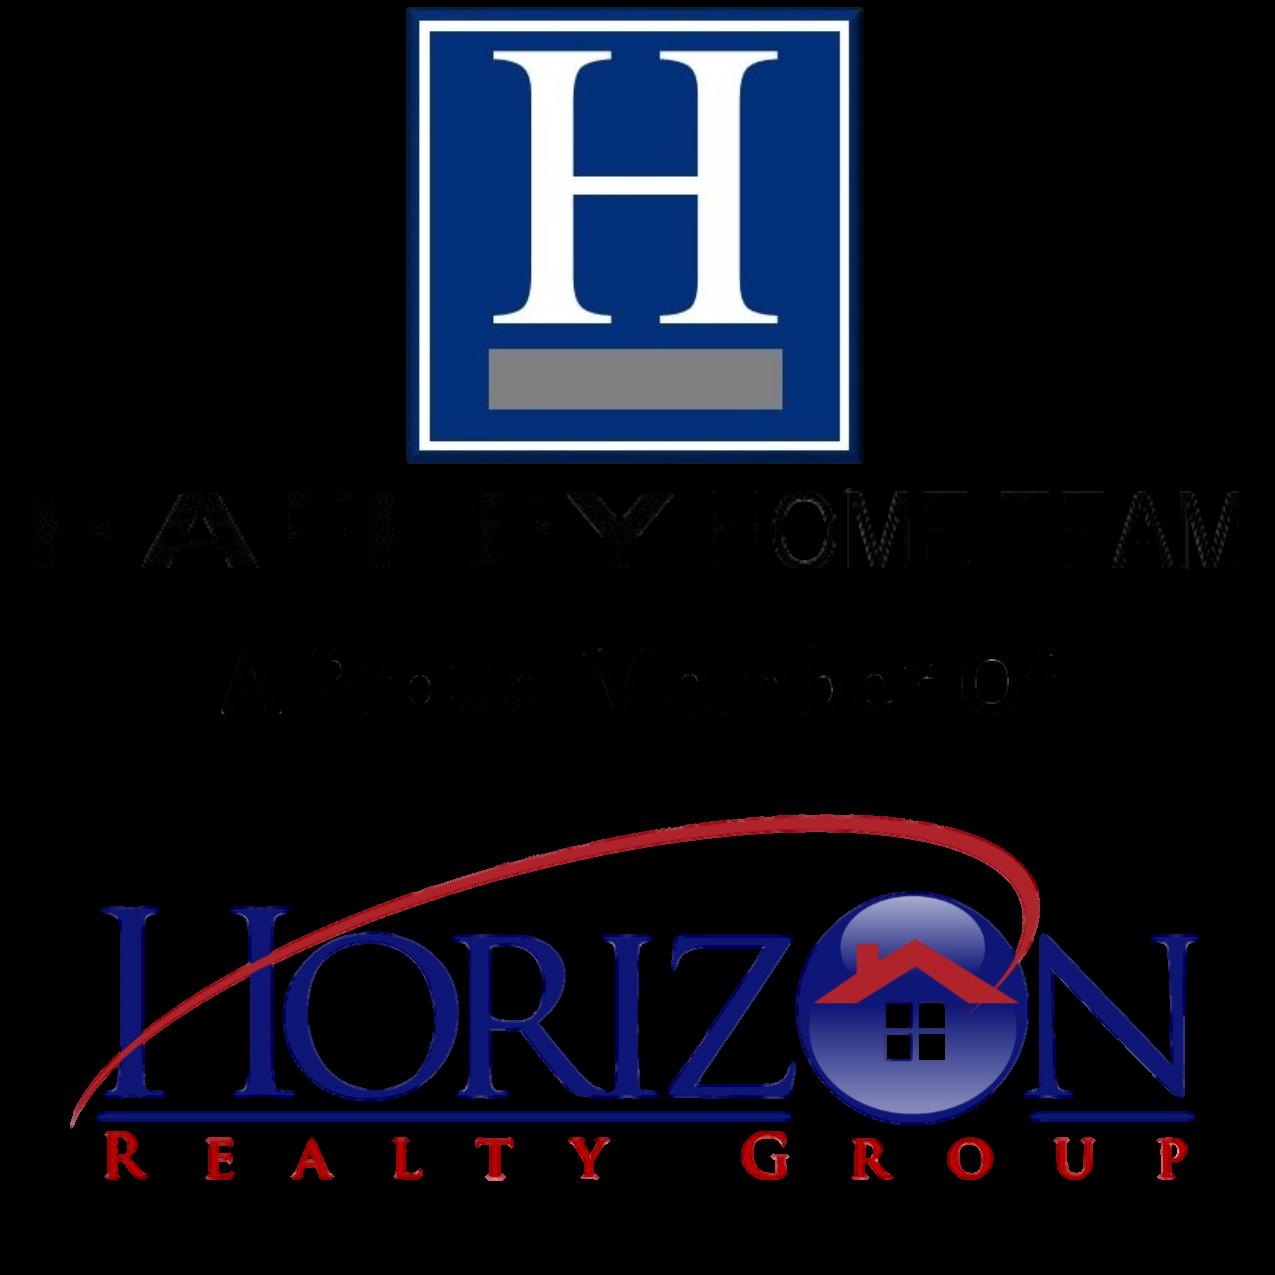 Horizon Realty Group, LLC